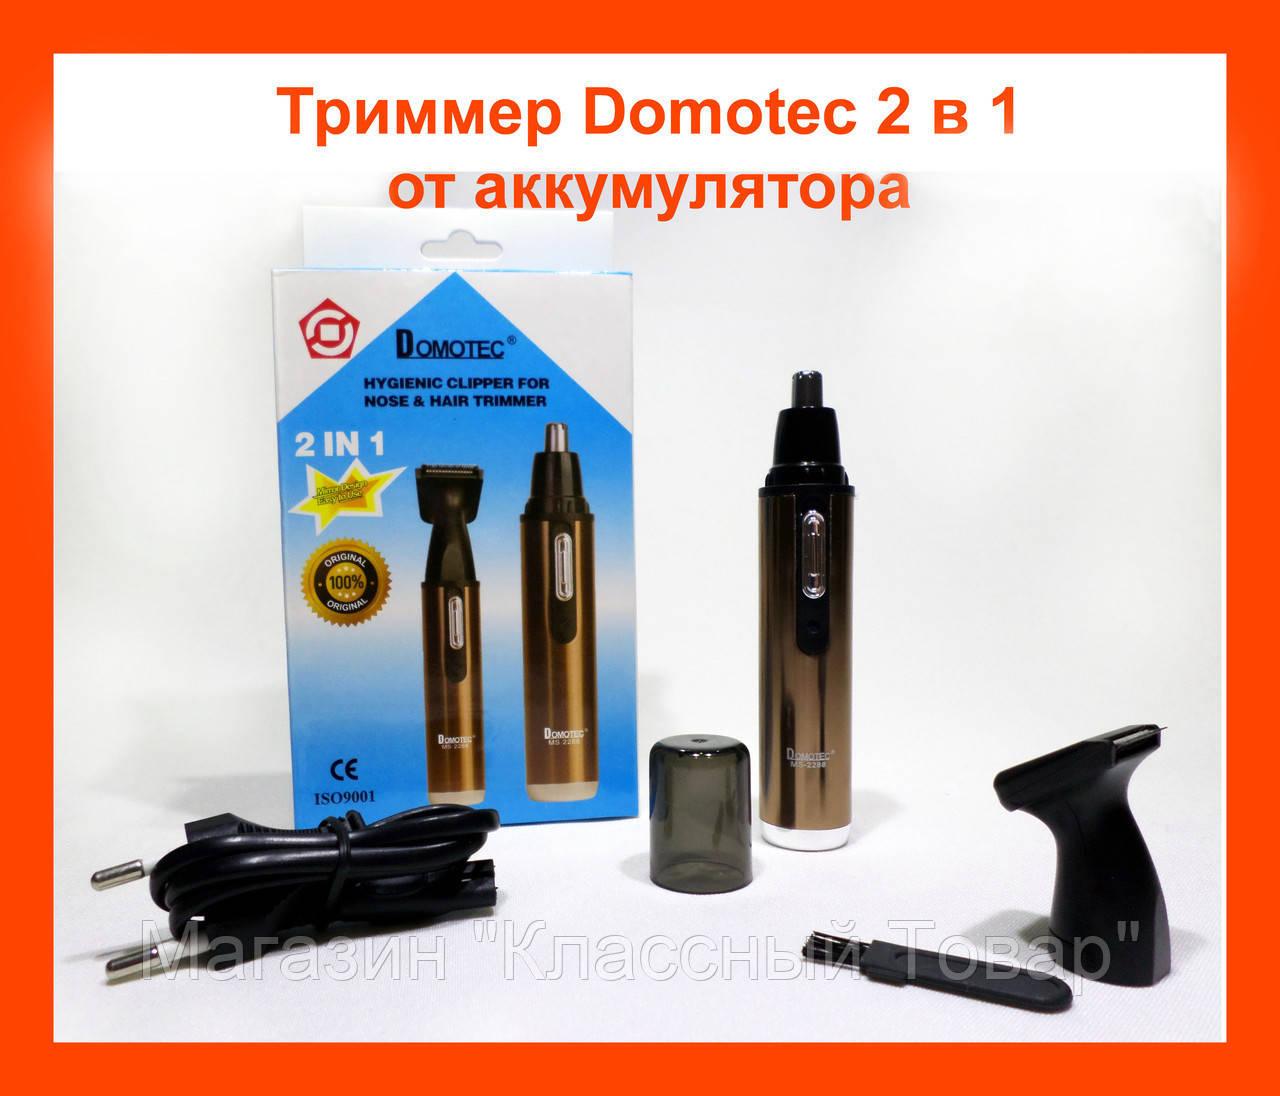 SALE! Триммер Domotec 2 в 1 от аккумулятора MS-2288